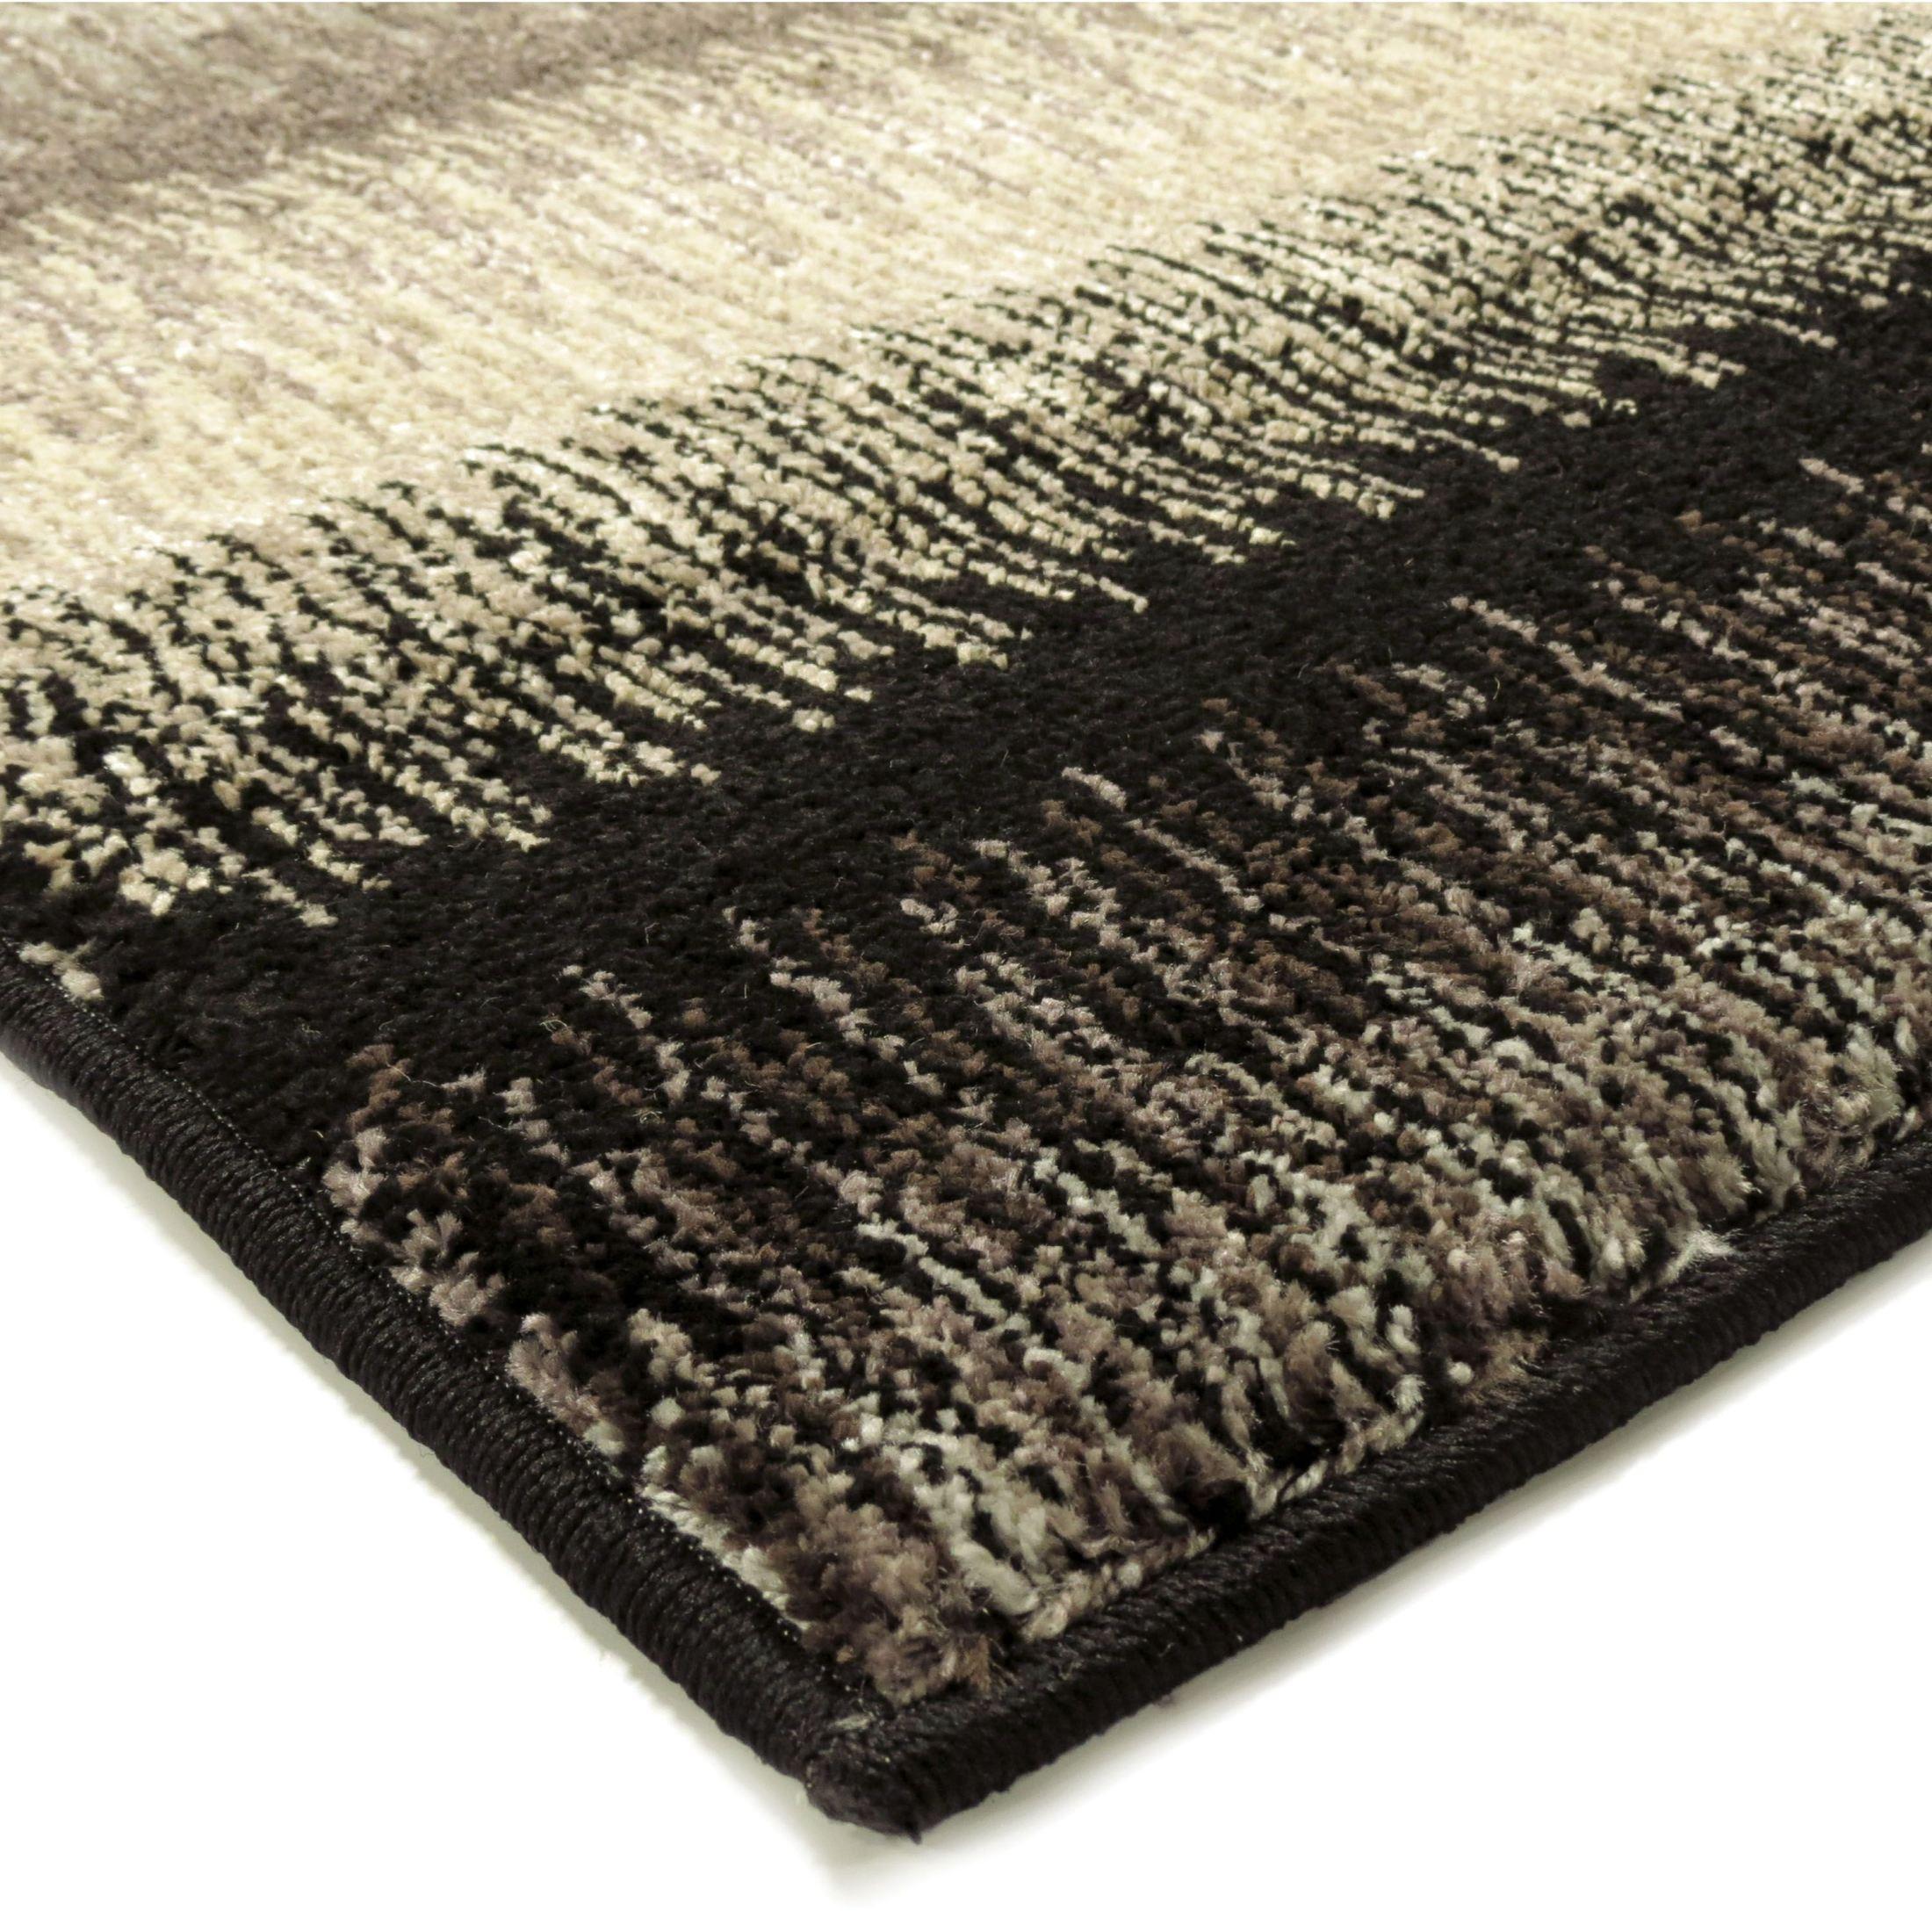 Discount 8x11 Area Rugs: American Heritage Stripes Fresco Stripe Multi Large Area